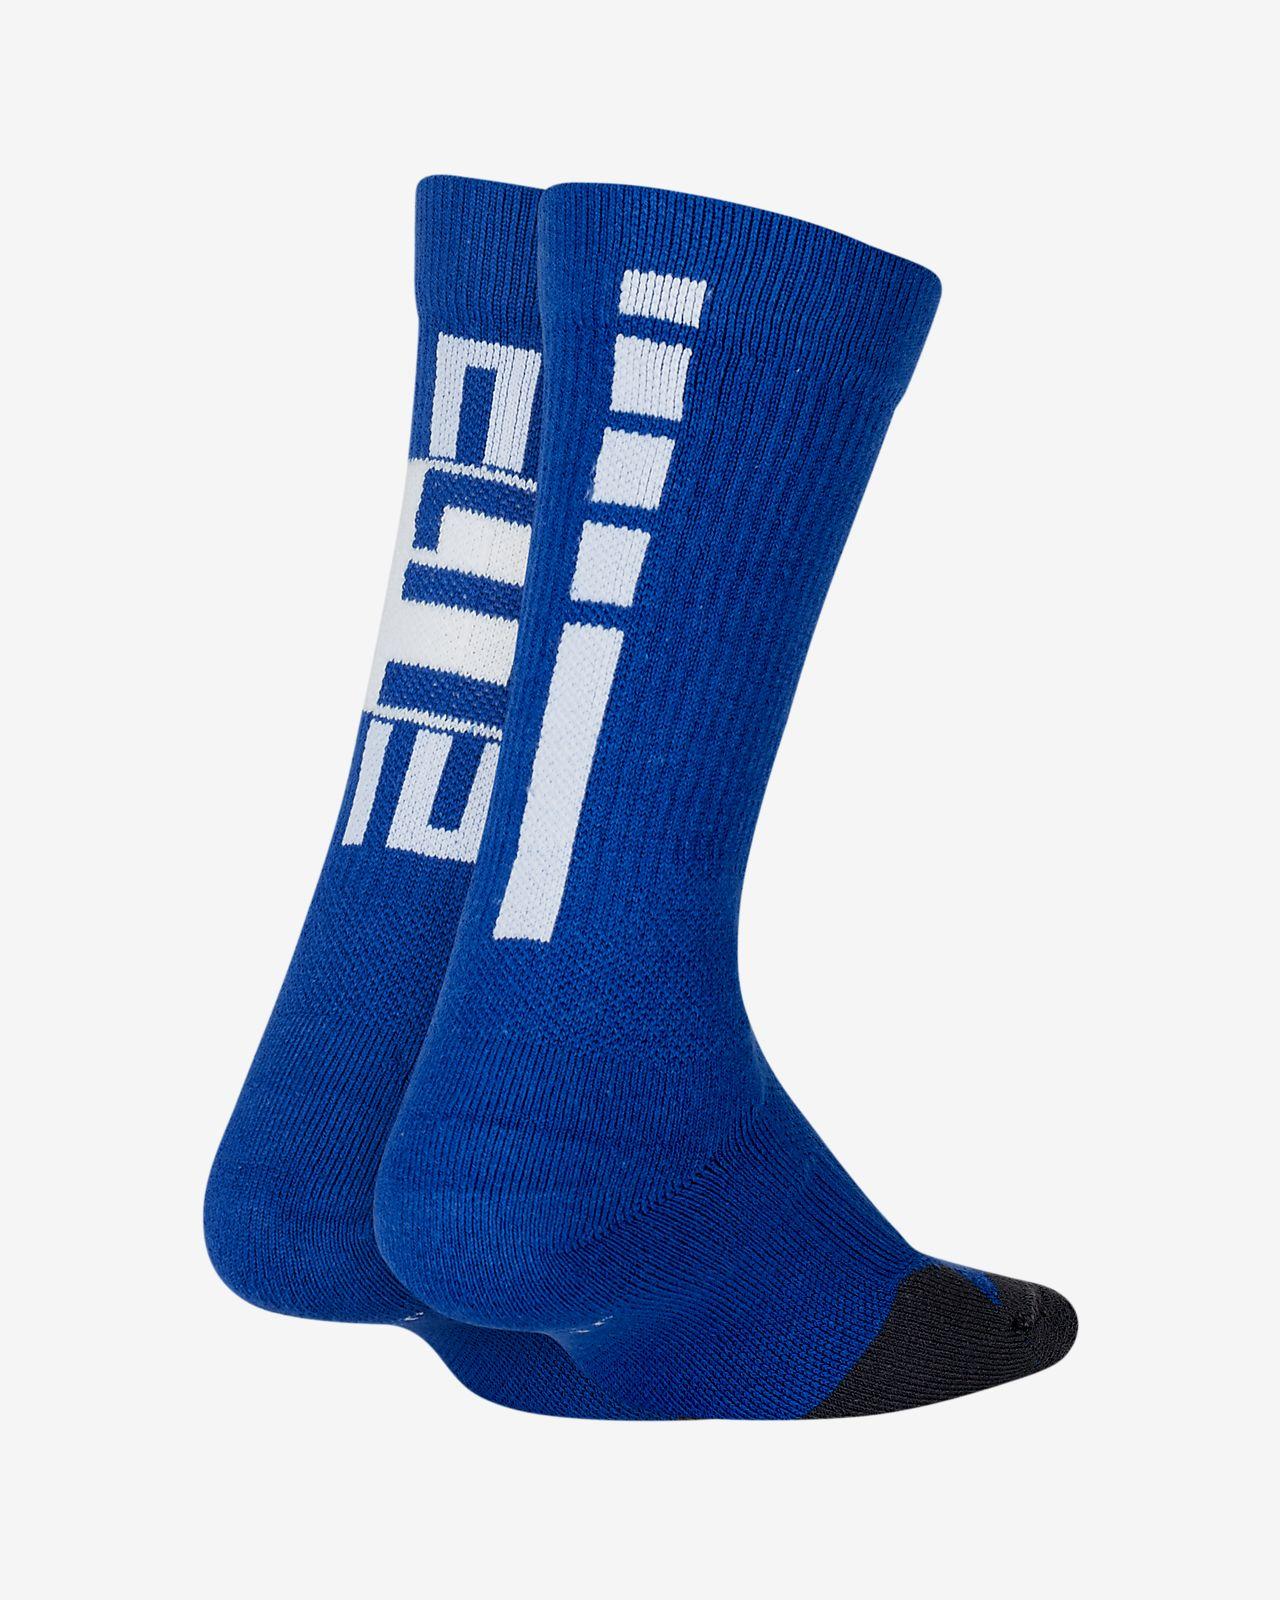 175de3611 Nike Elite Big Kids  Crew Socks (2 Pairs). Nike.com